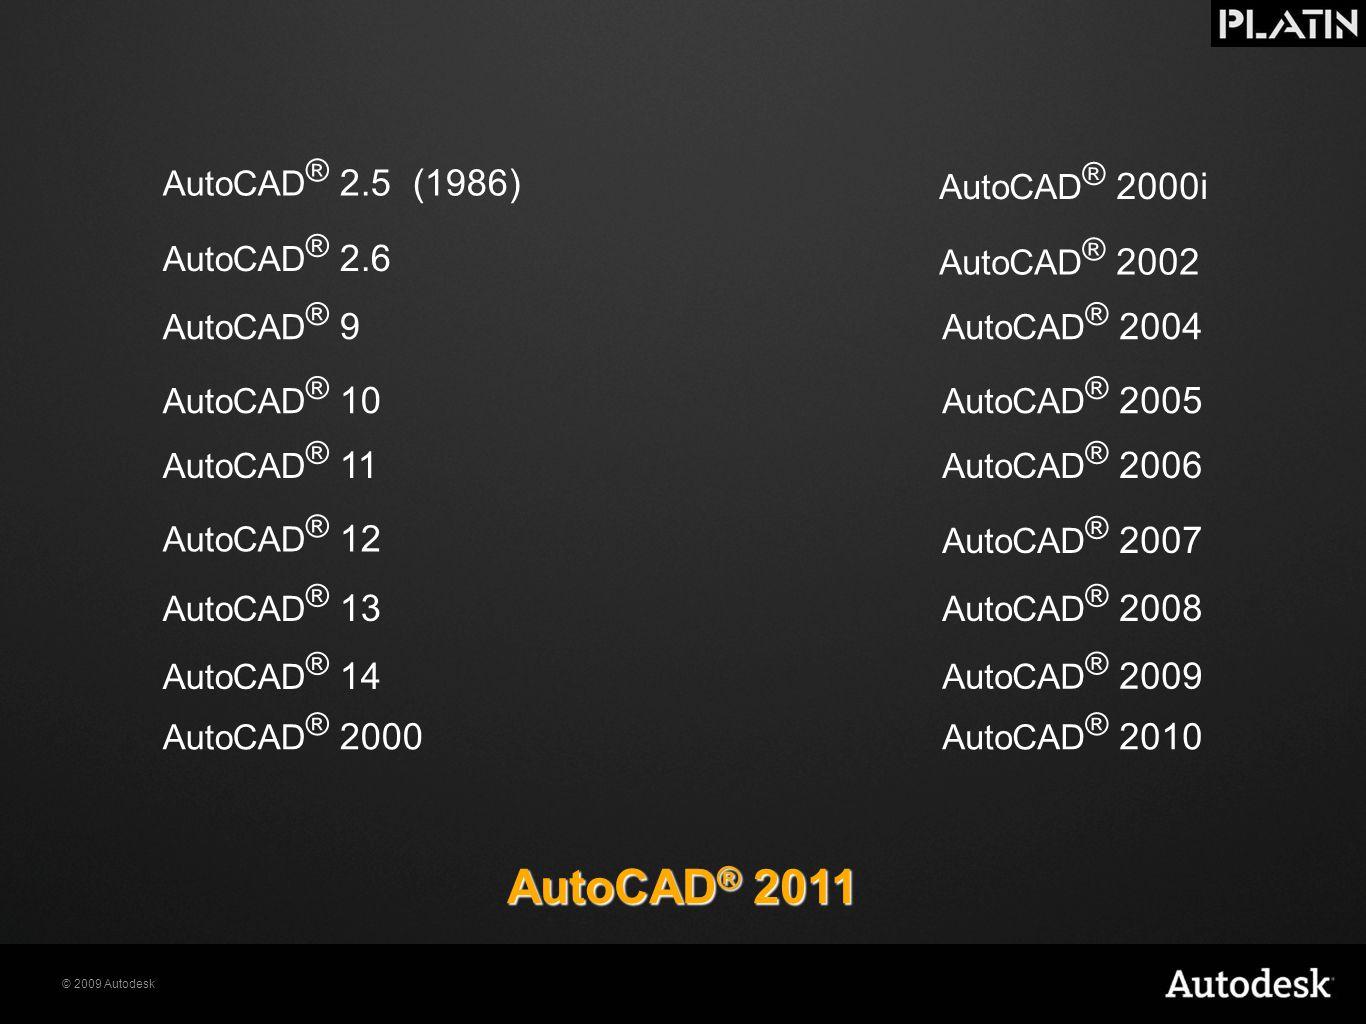 © 2009 Autodesk AutoCAD ® 2.5 (1986) AutoCAD ® 2.6 AutoCAD ® 11 AutoCAD ® 10 AutoCAD ® 9 AutoCAD ® 2000i AutoCAD ® 2000 AutoCAD ® 14 AutoCAD ® 13 Auto